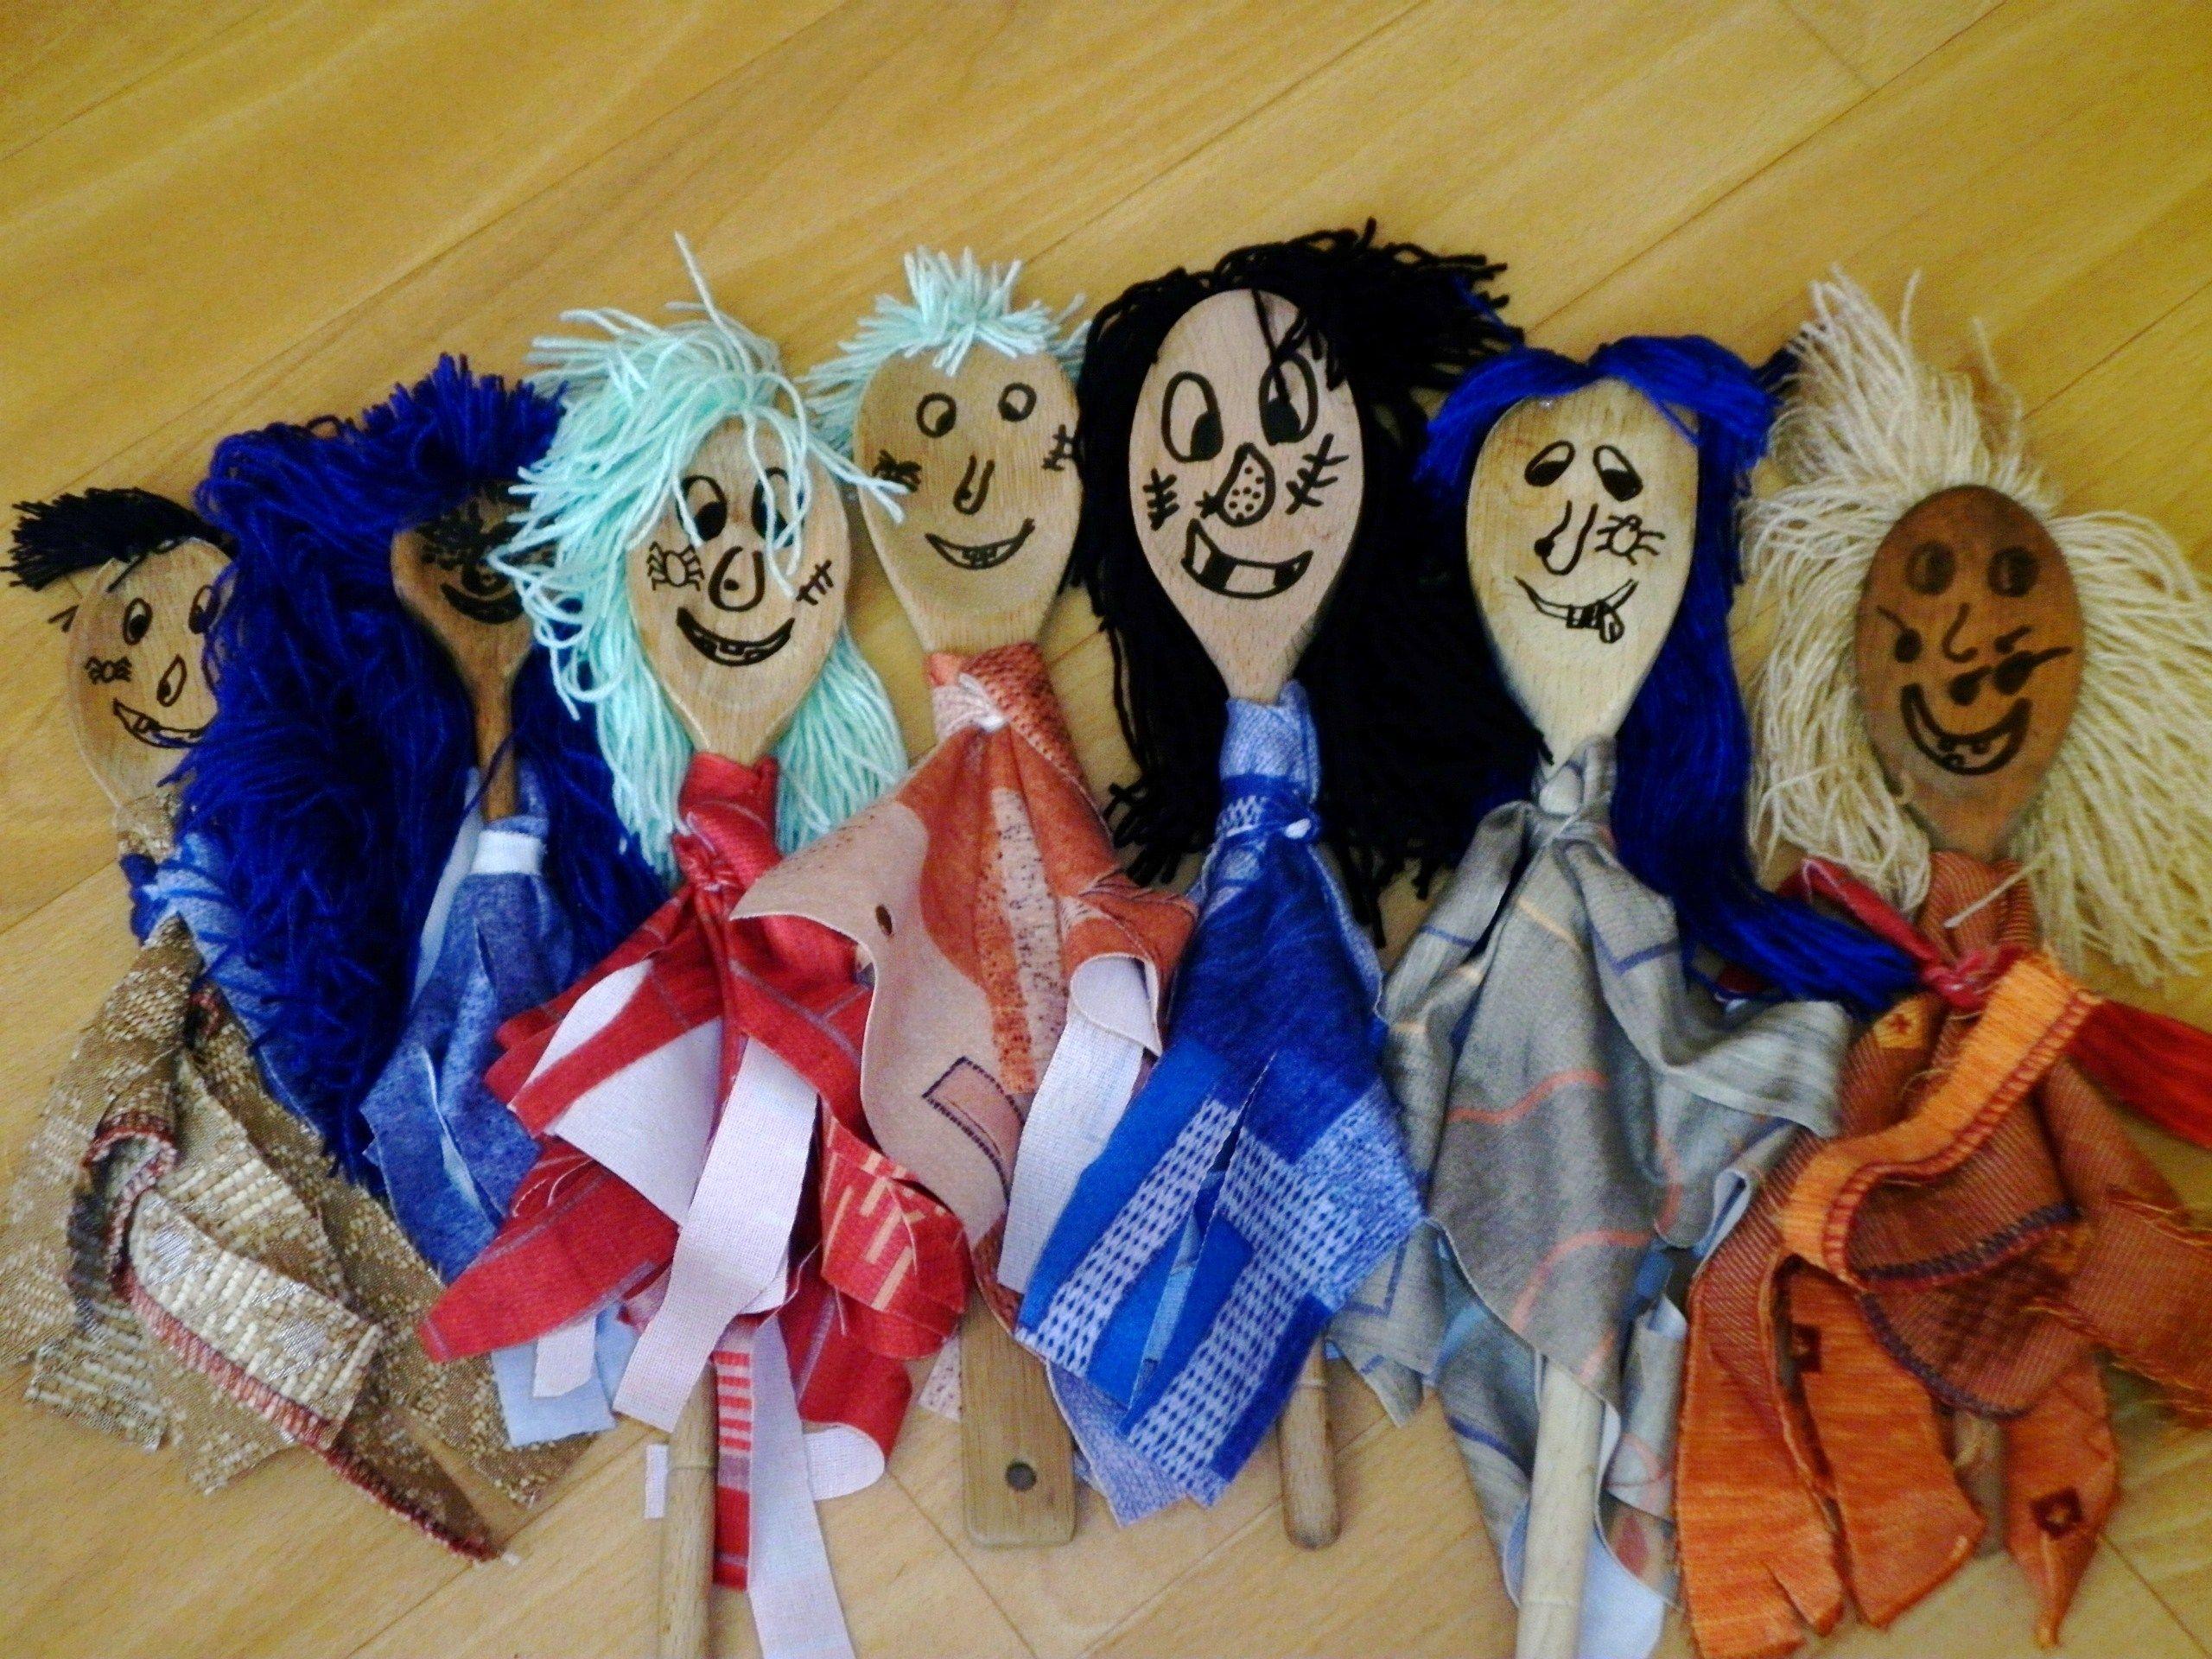 Čarodějnice | Halloween decorations, Halloween diy, Halloween witch